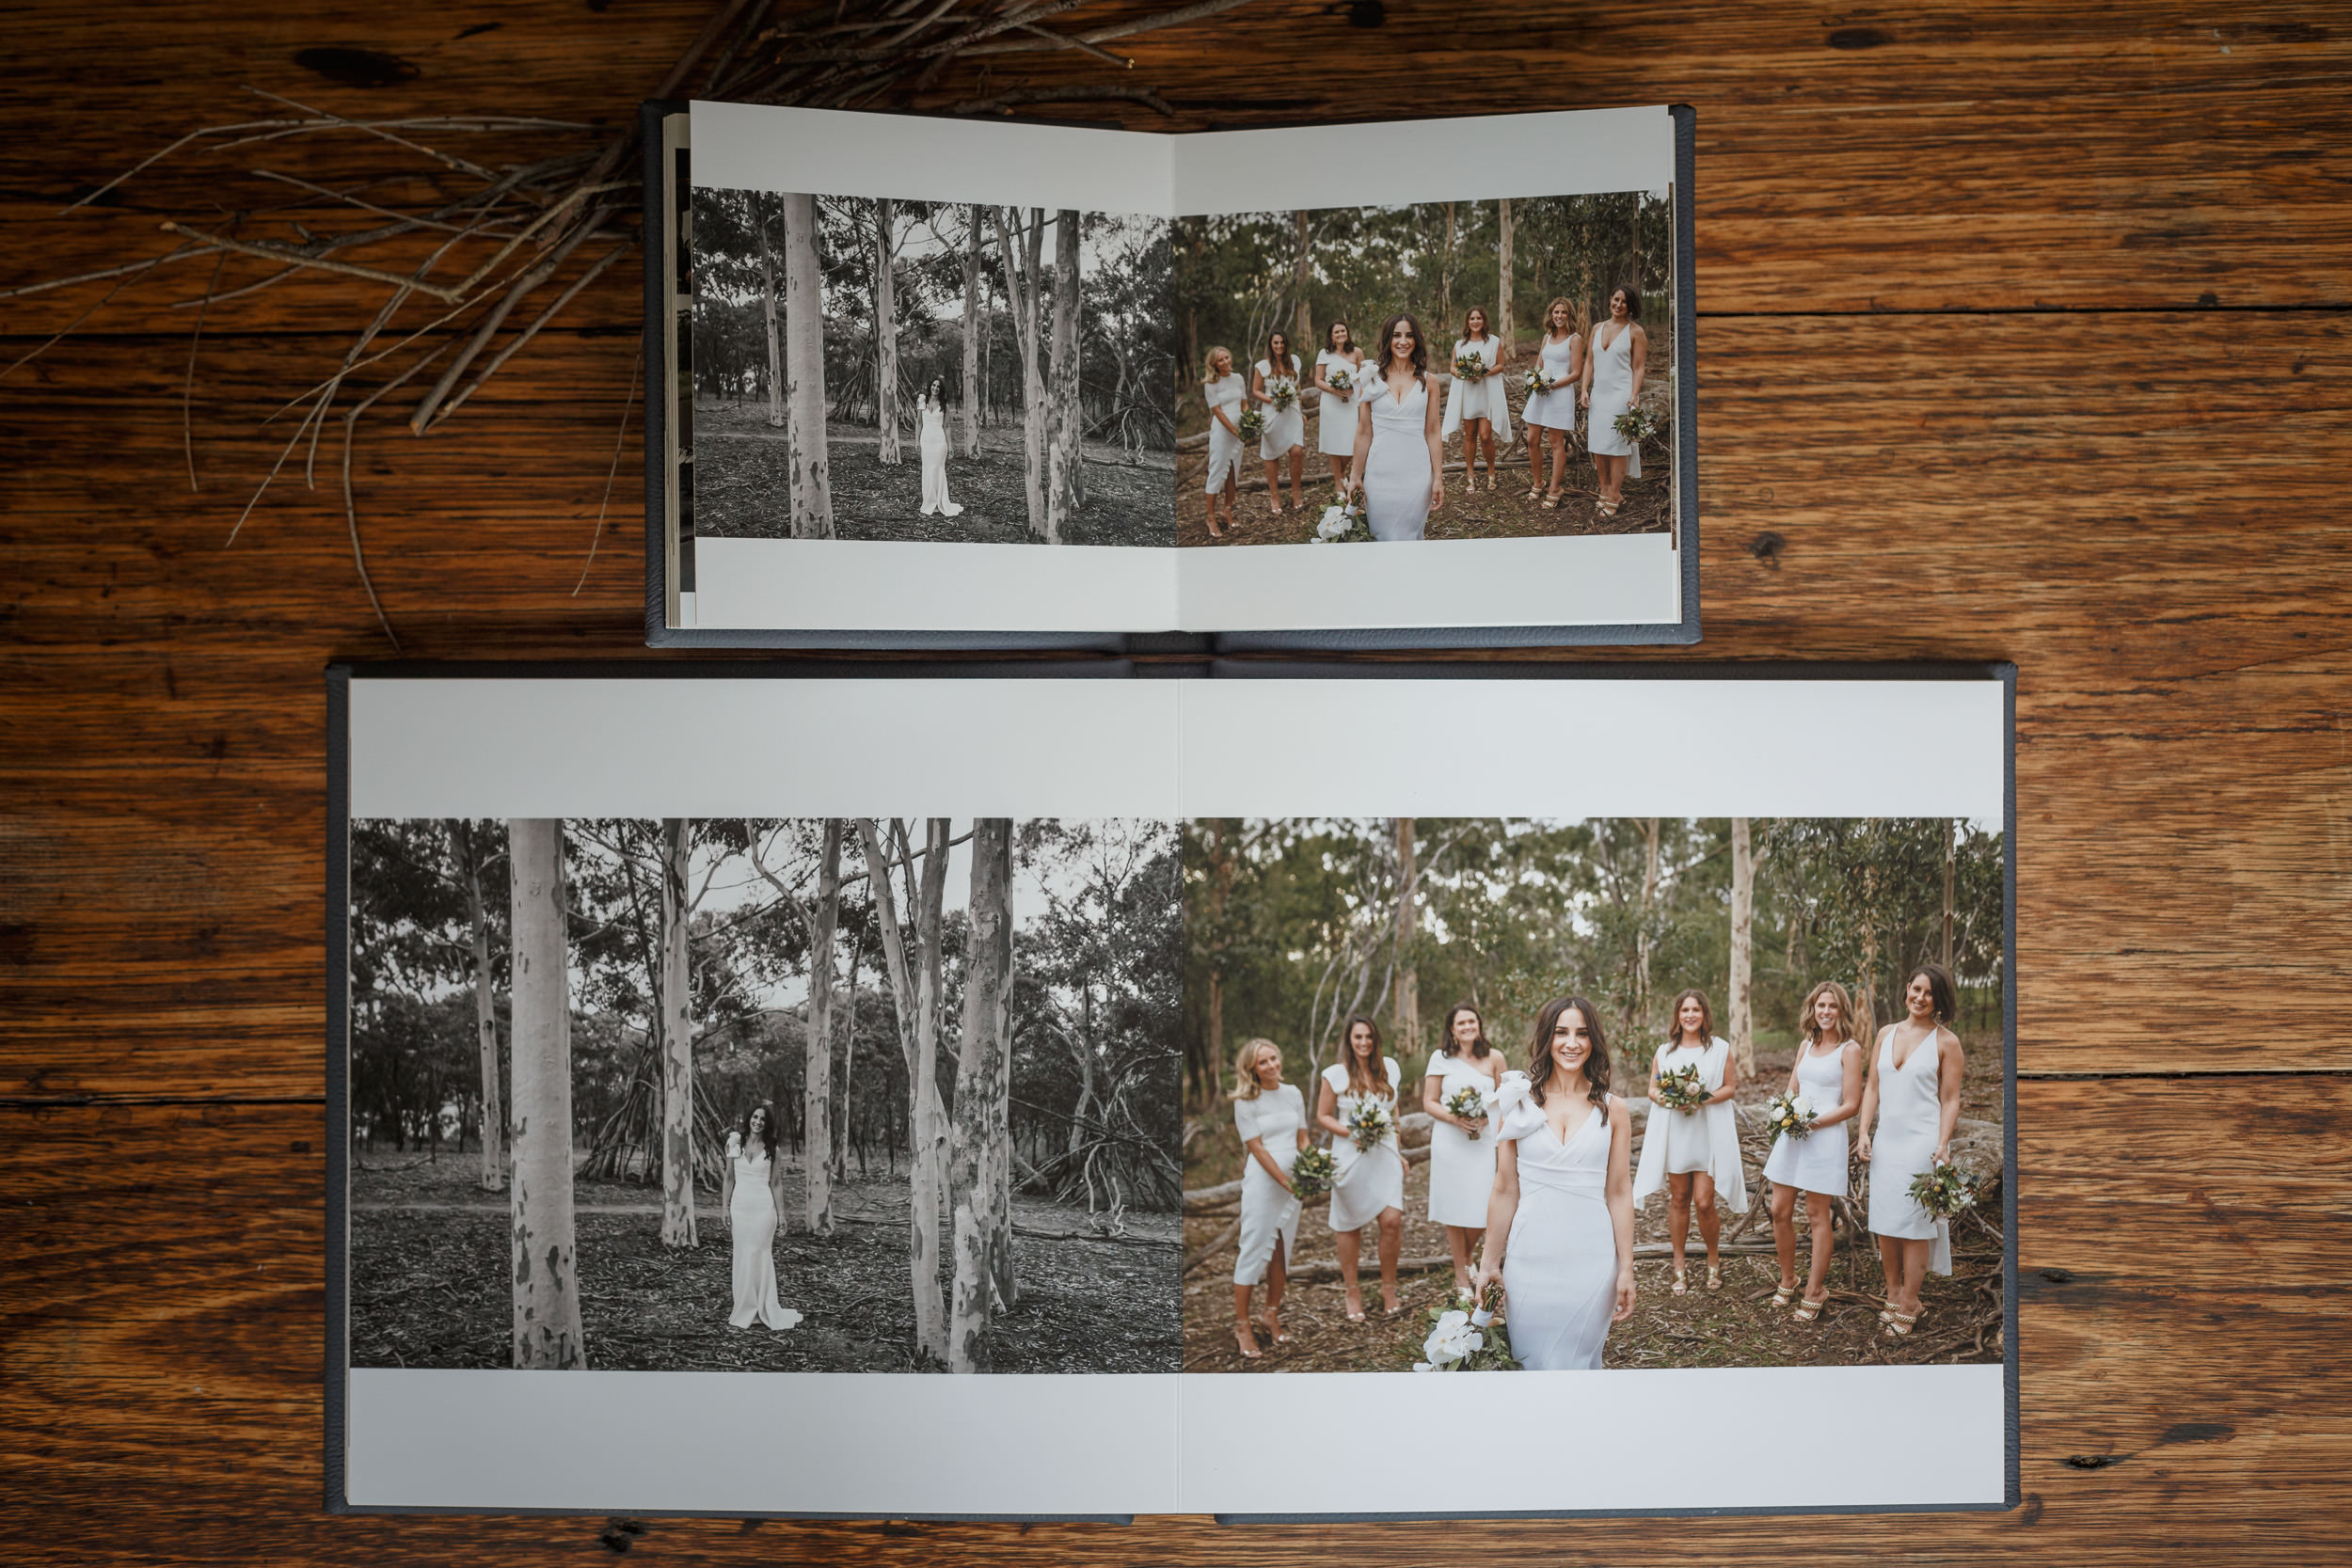 Album photos_TEP20143.jpg